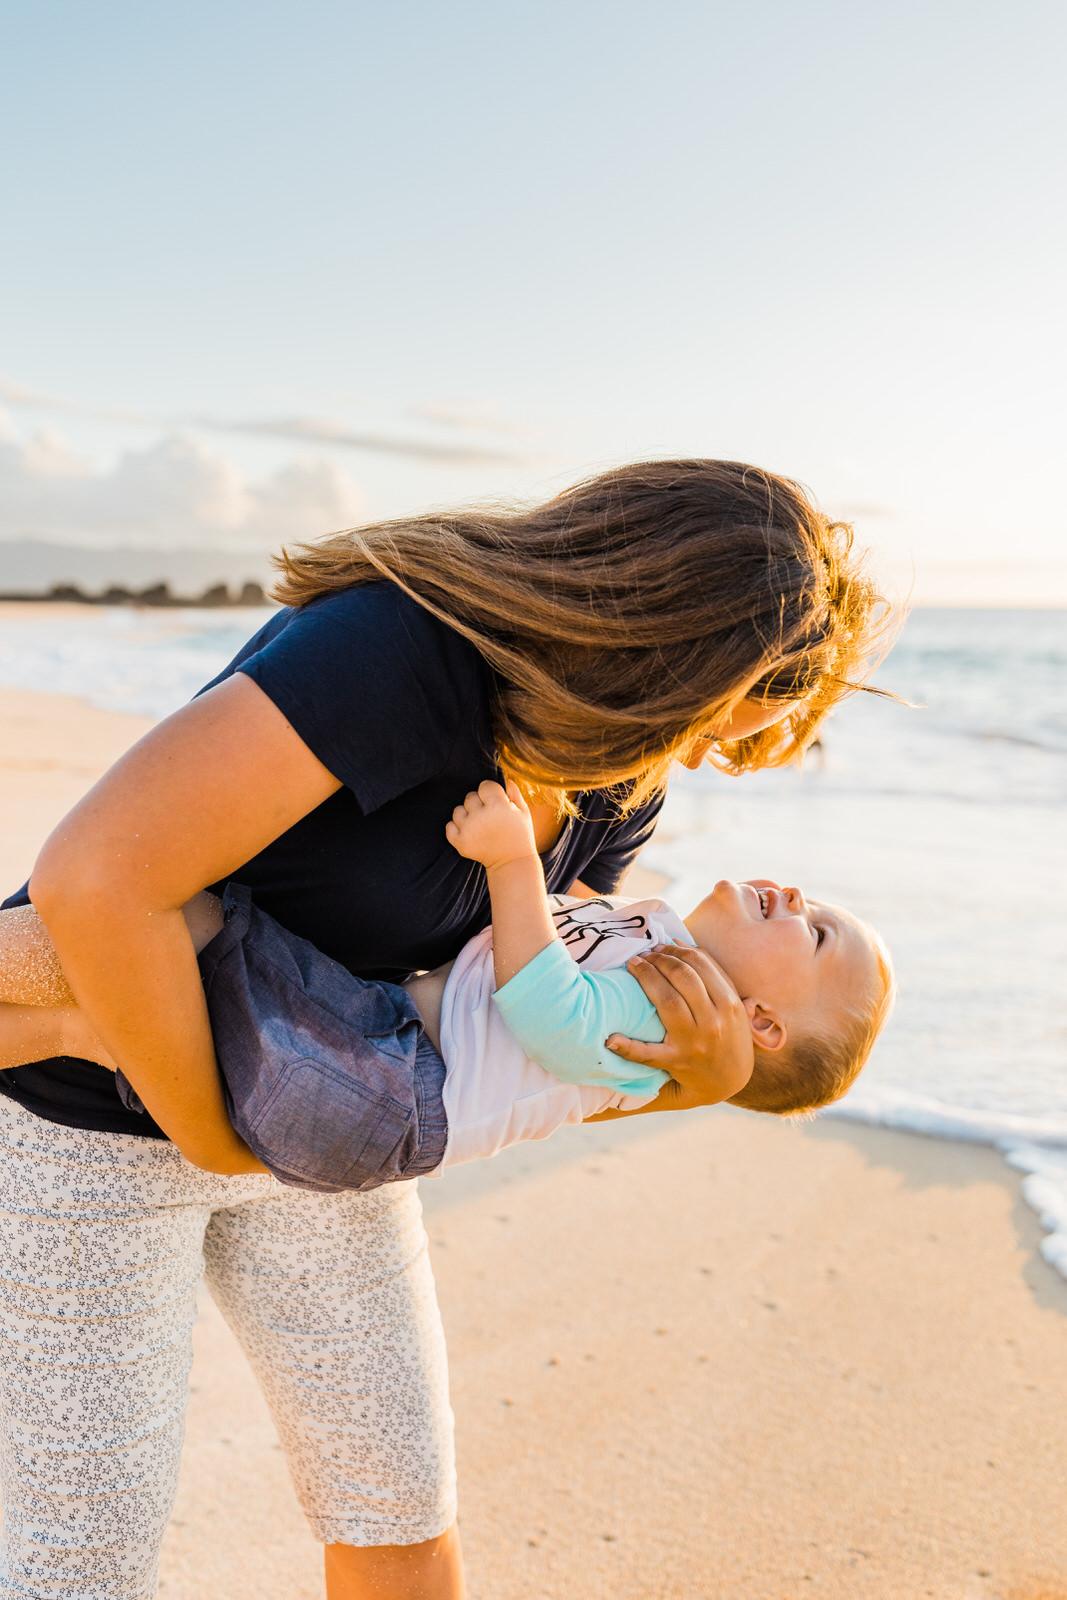 extended-family-big-island-vacation-cousins-grandparents-beach-waikoloa-sunset-hawaii-7078.jpg